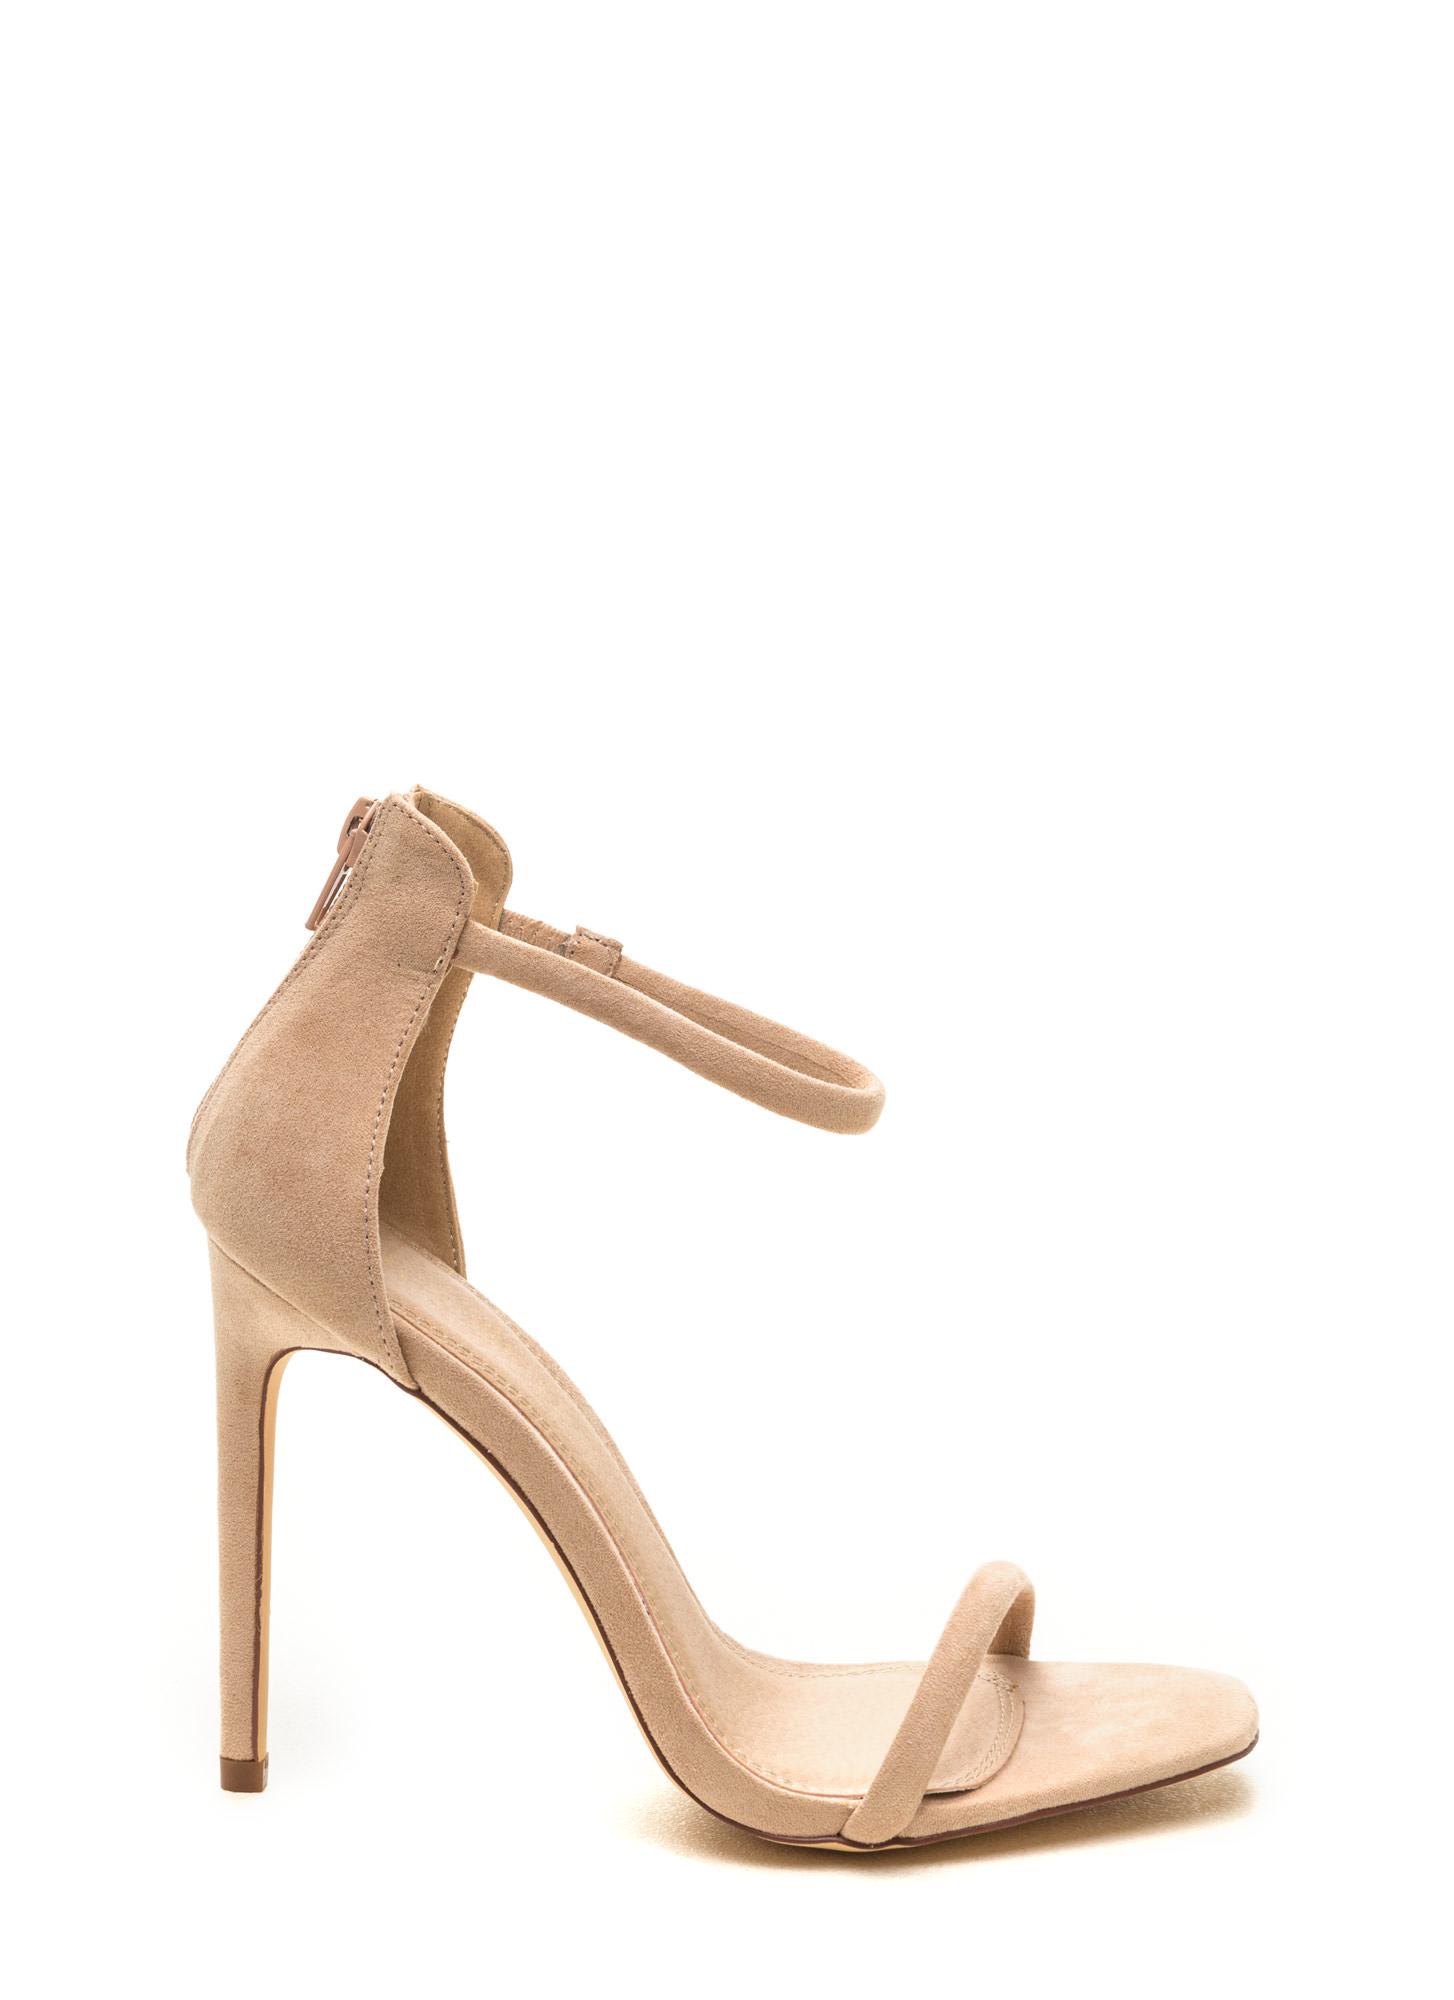 fab146f247 Just One Faux Suede Ankle Strap Heels PURPLE DUSTYPINK NUDE ...